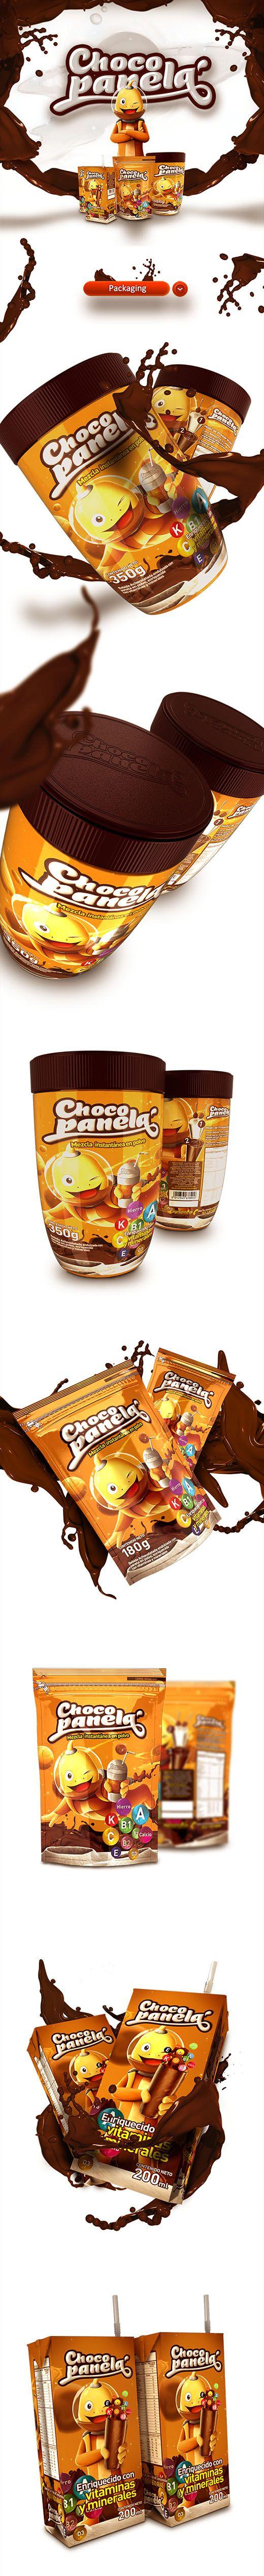 CHOCOPANELA BAG, POT AND CARTONS Packaging Development